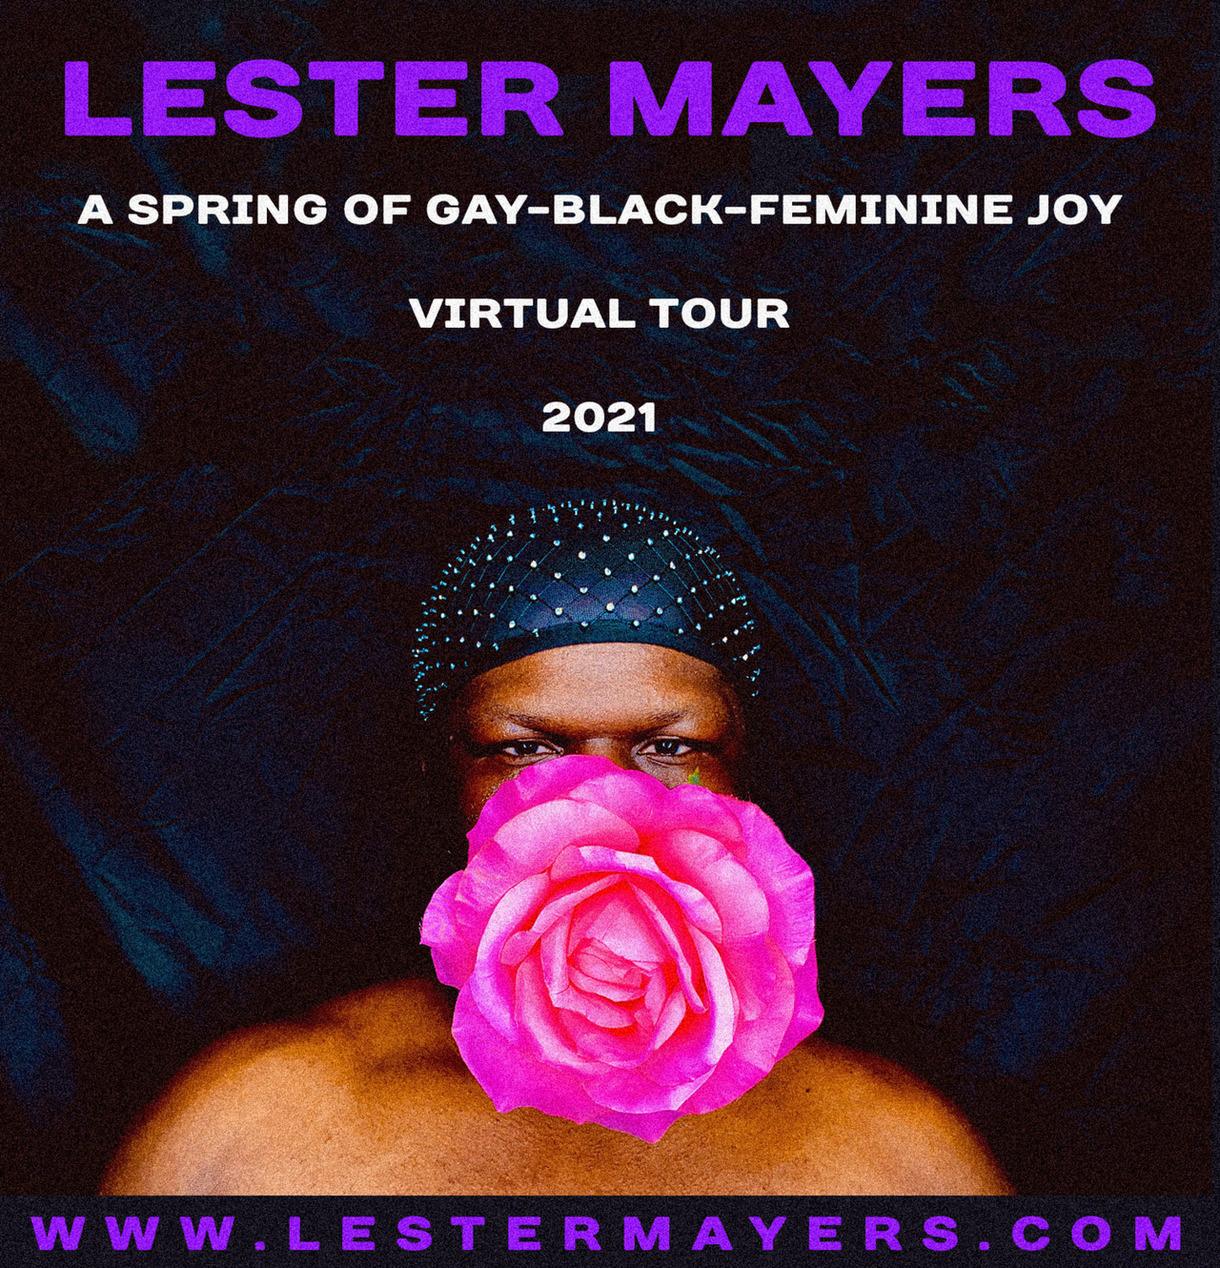 Lester Mayers website